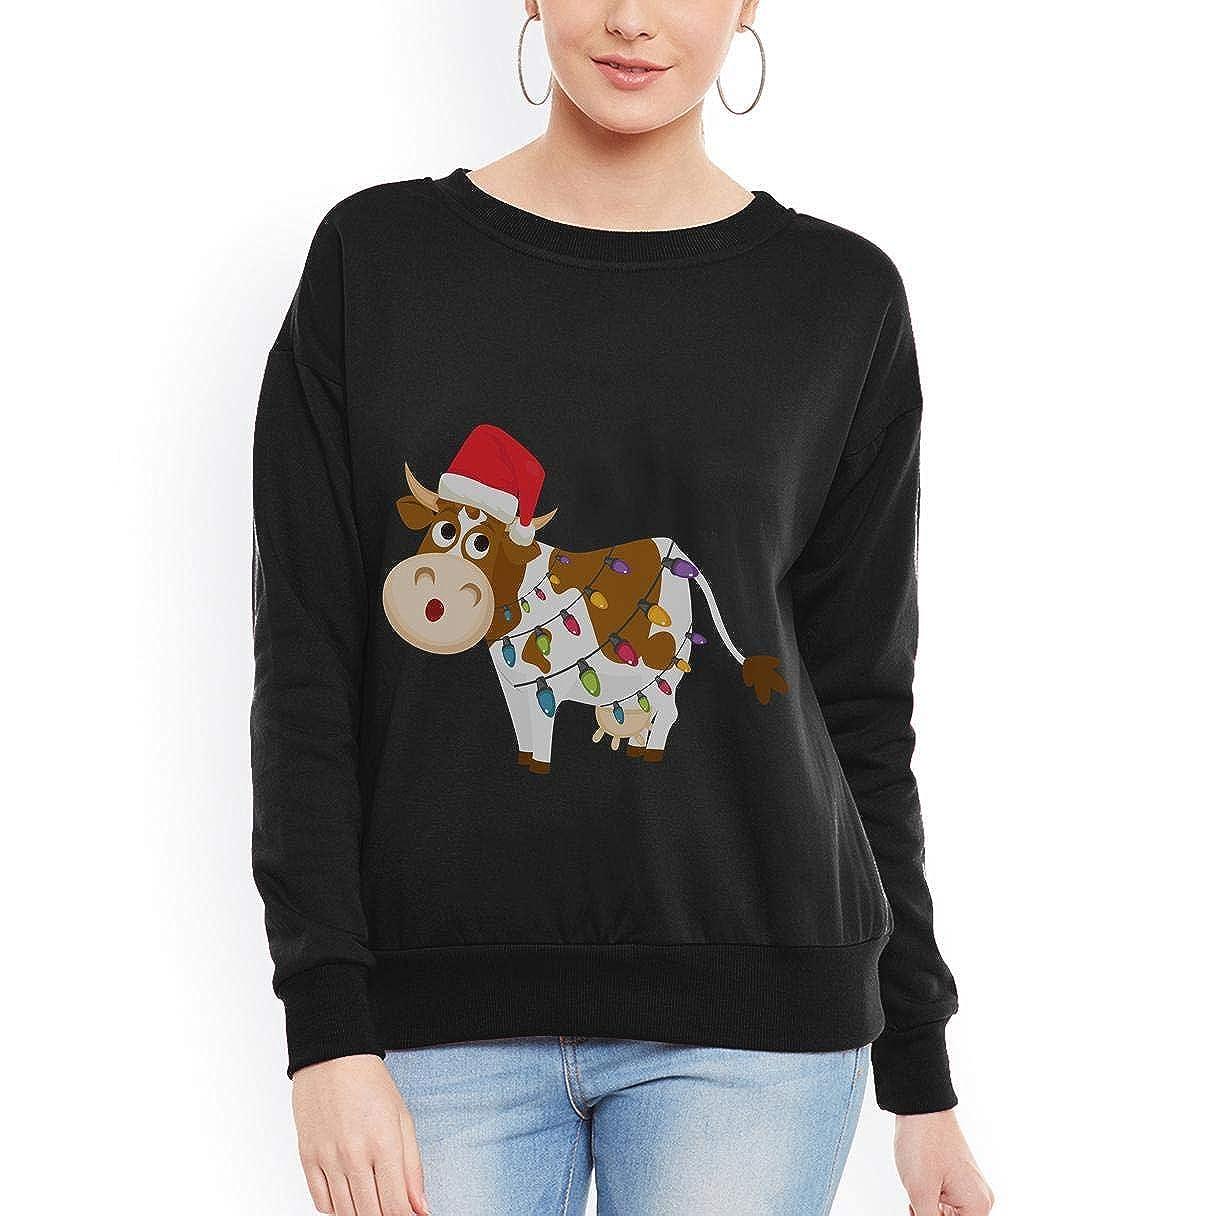 Doryti Cow with Santas Hat Christmas Lights Unisex Sweatshirt tee